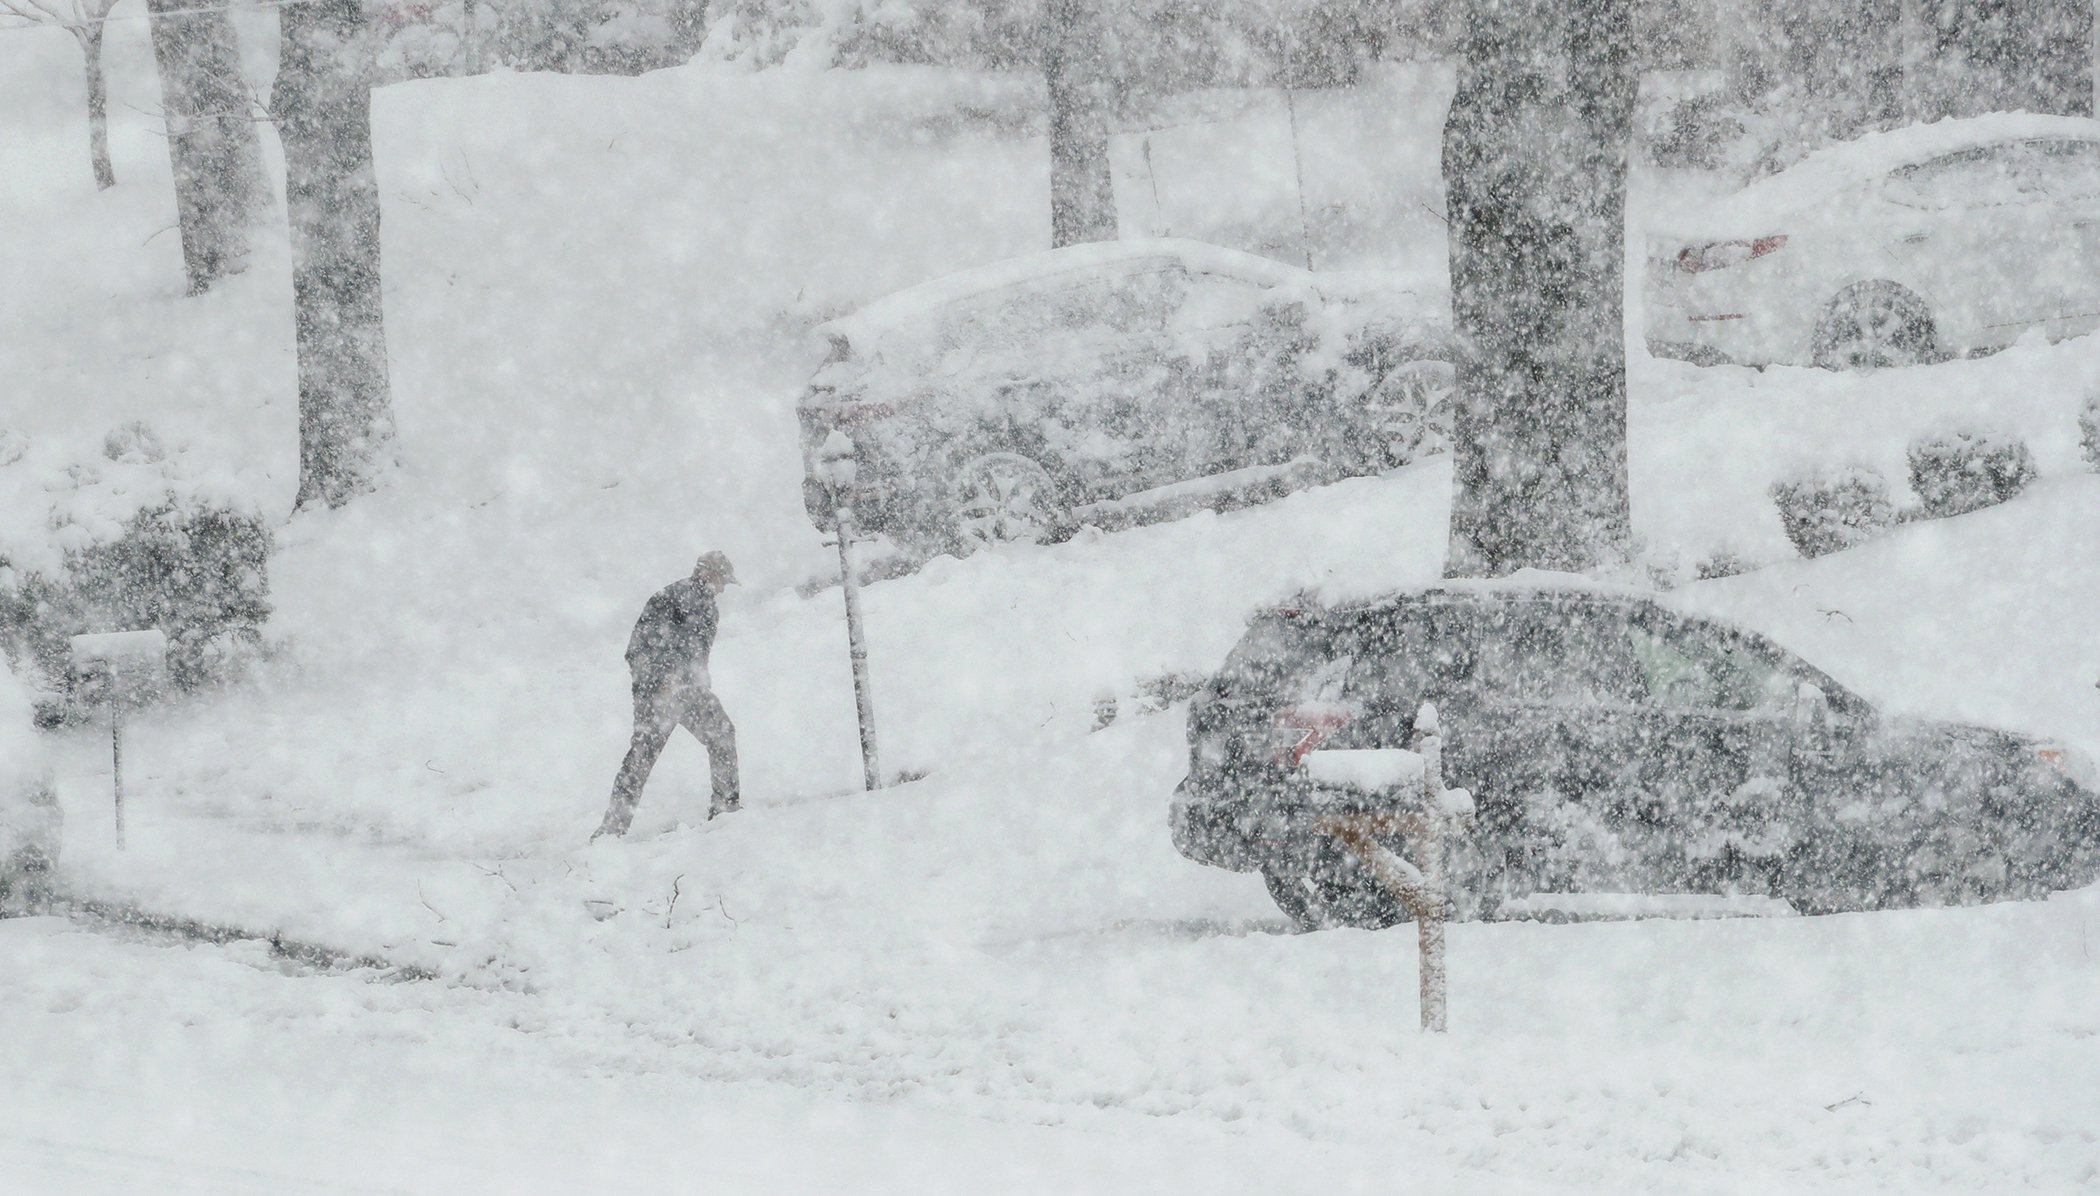 North-East-US-Snow-Storm.jpg